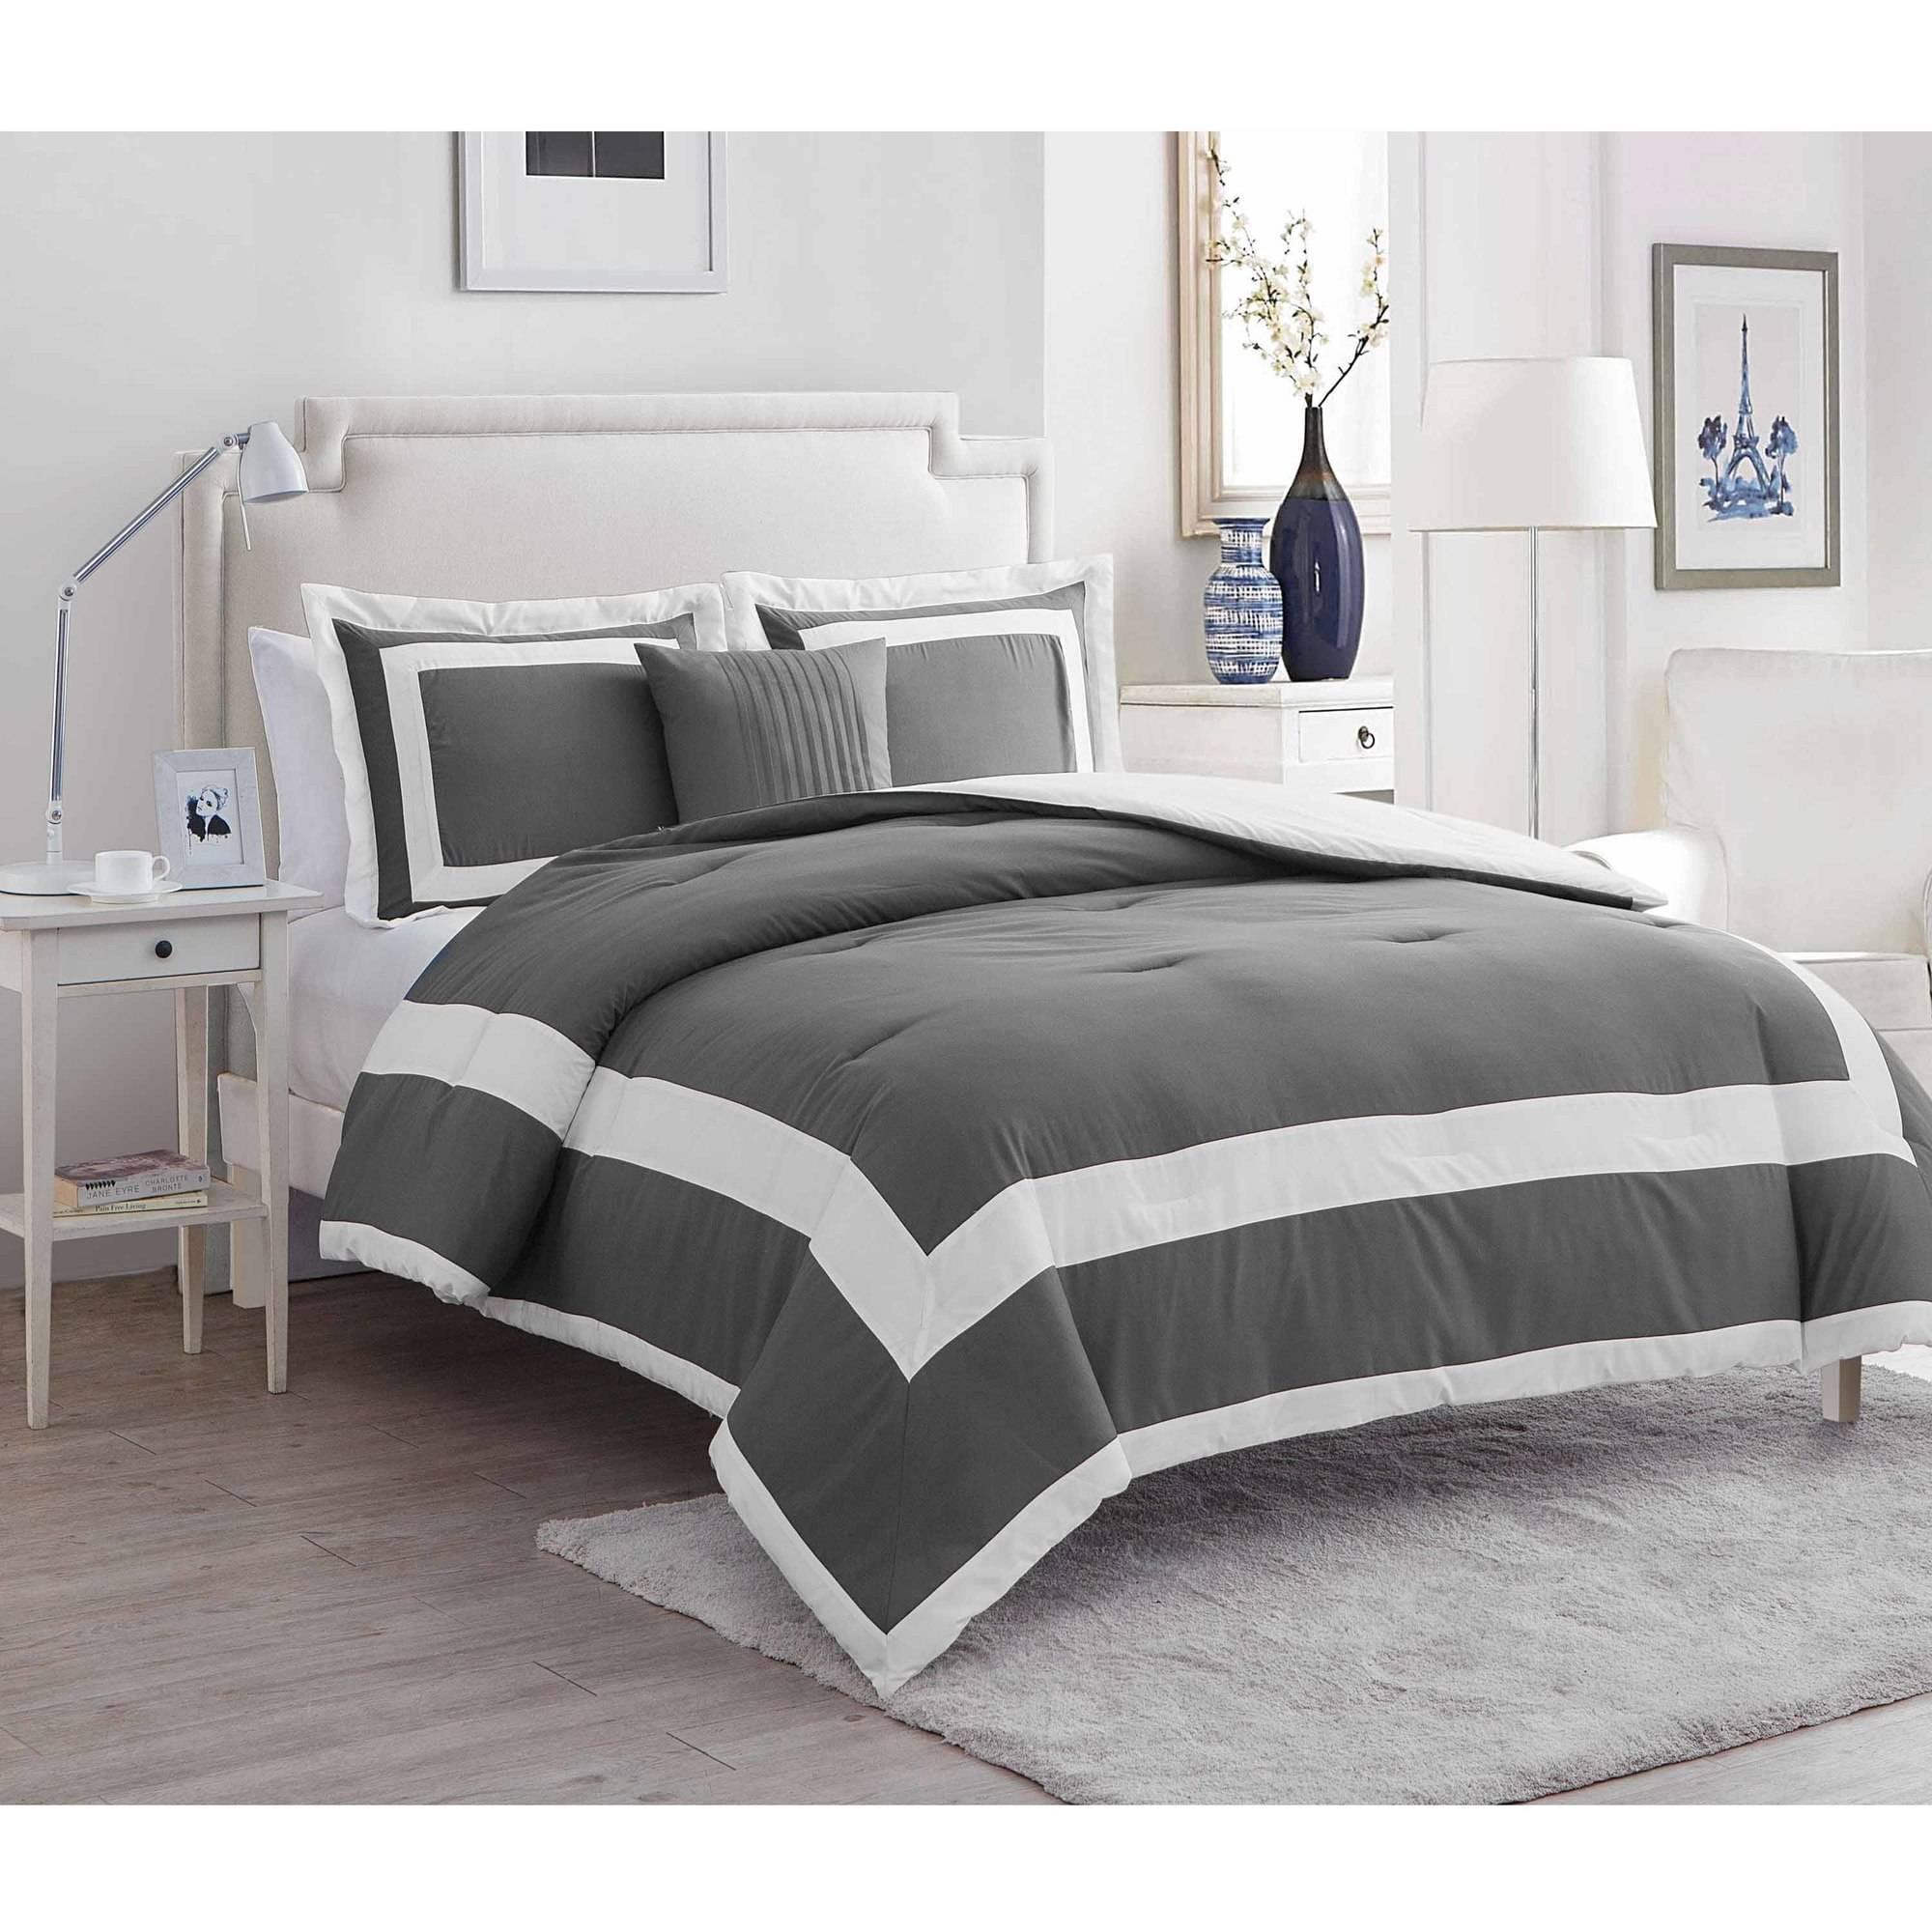 VCNY Home Avianna Hotel 4-Piece Bedding Comforter Set by Victoria Classics